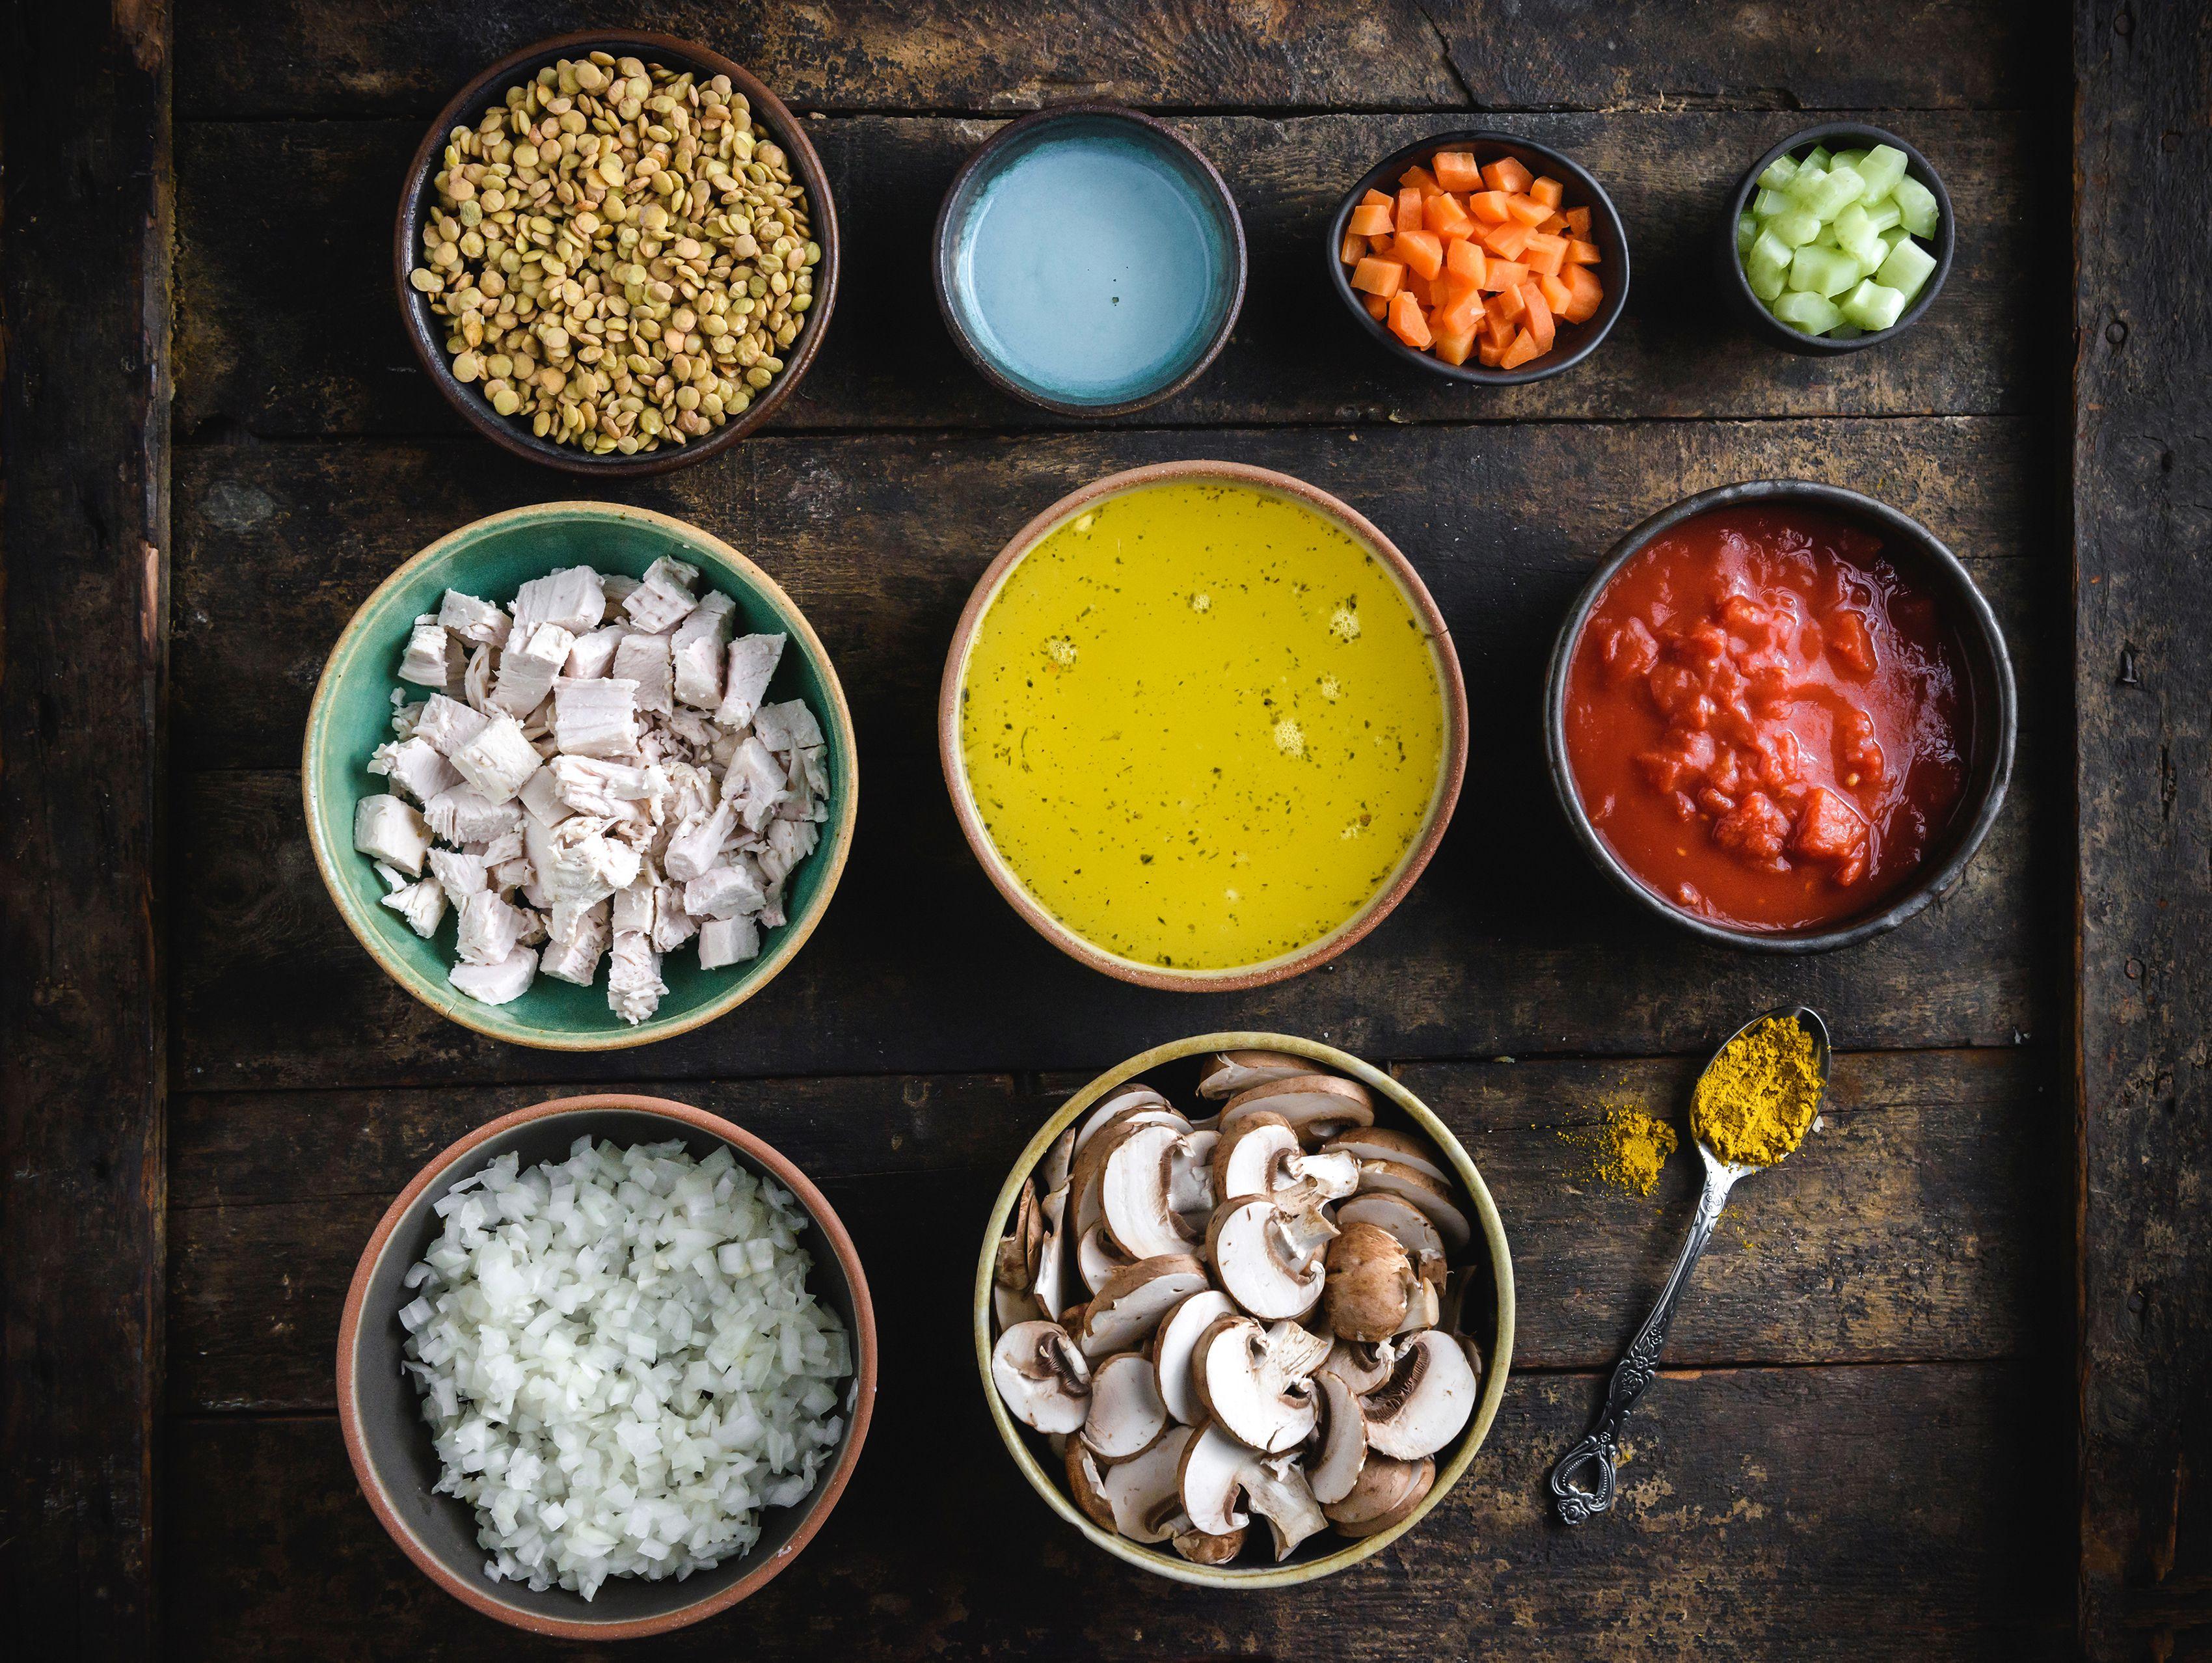 Gather the ingredients for turkey lentil soup